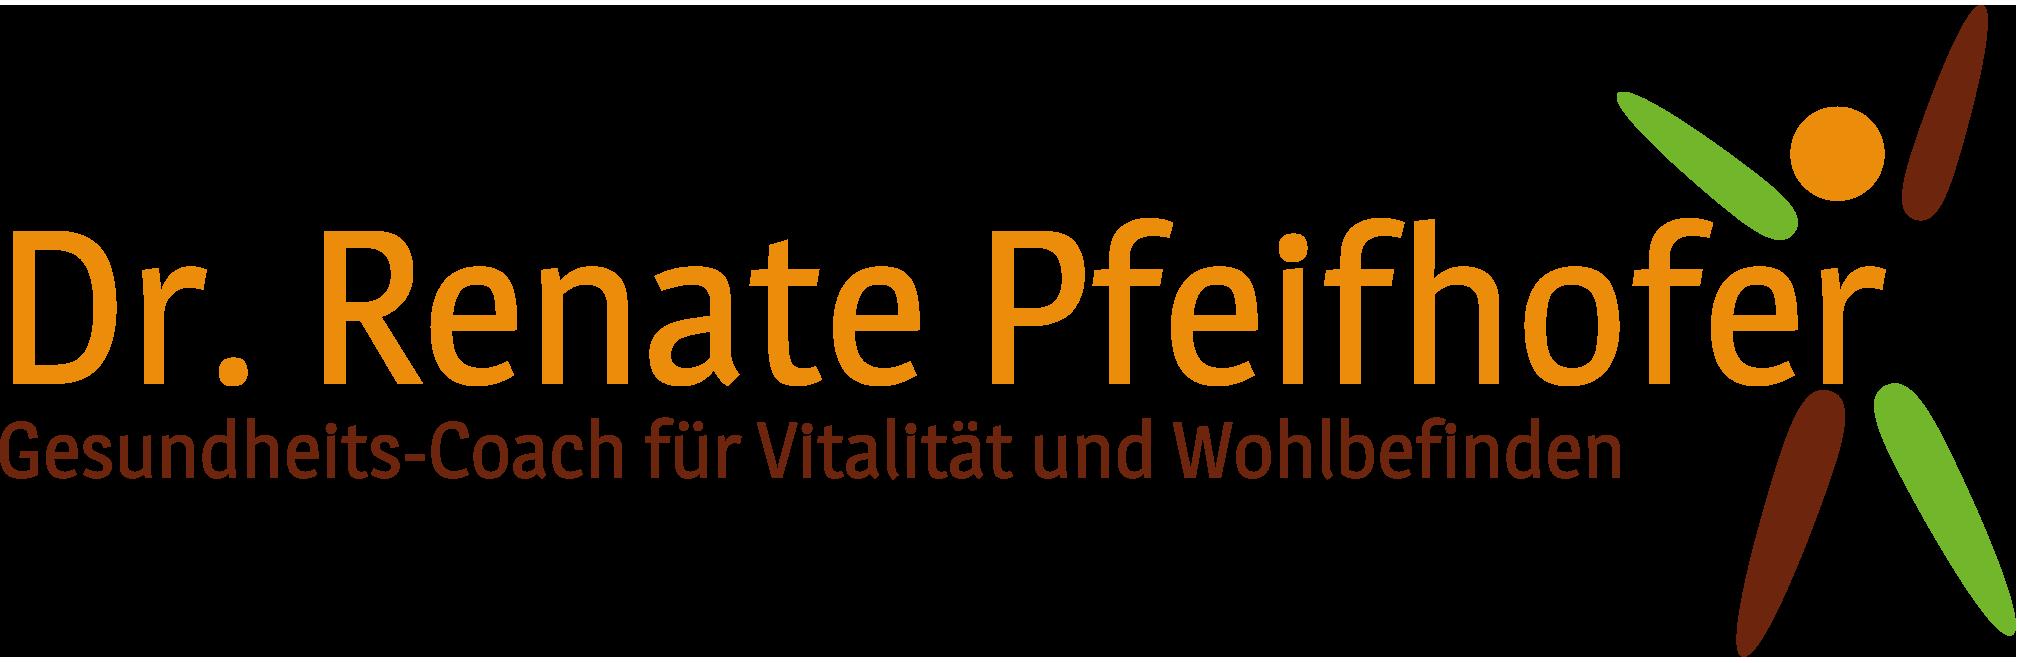 Dr. Renate Pfeifhofer